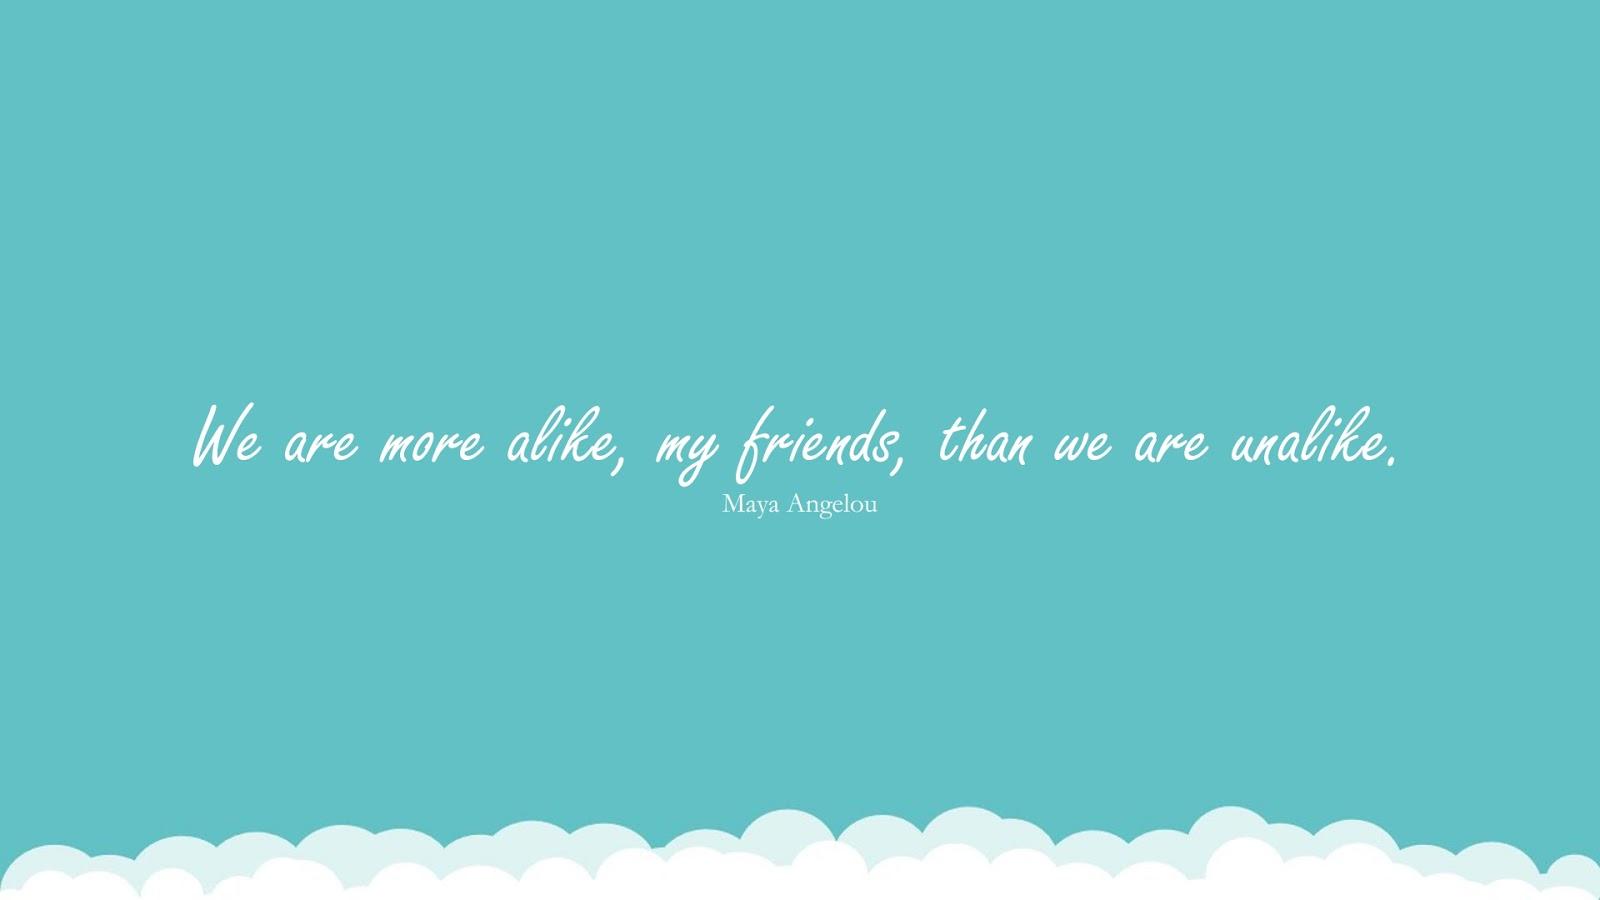 We are more alike, my friends, than we are unalike. (Maya Angelou);  #MayaAngelouQuotesandSayings